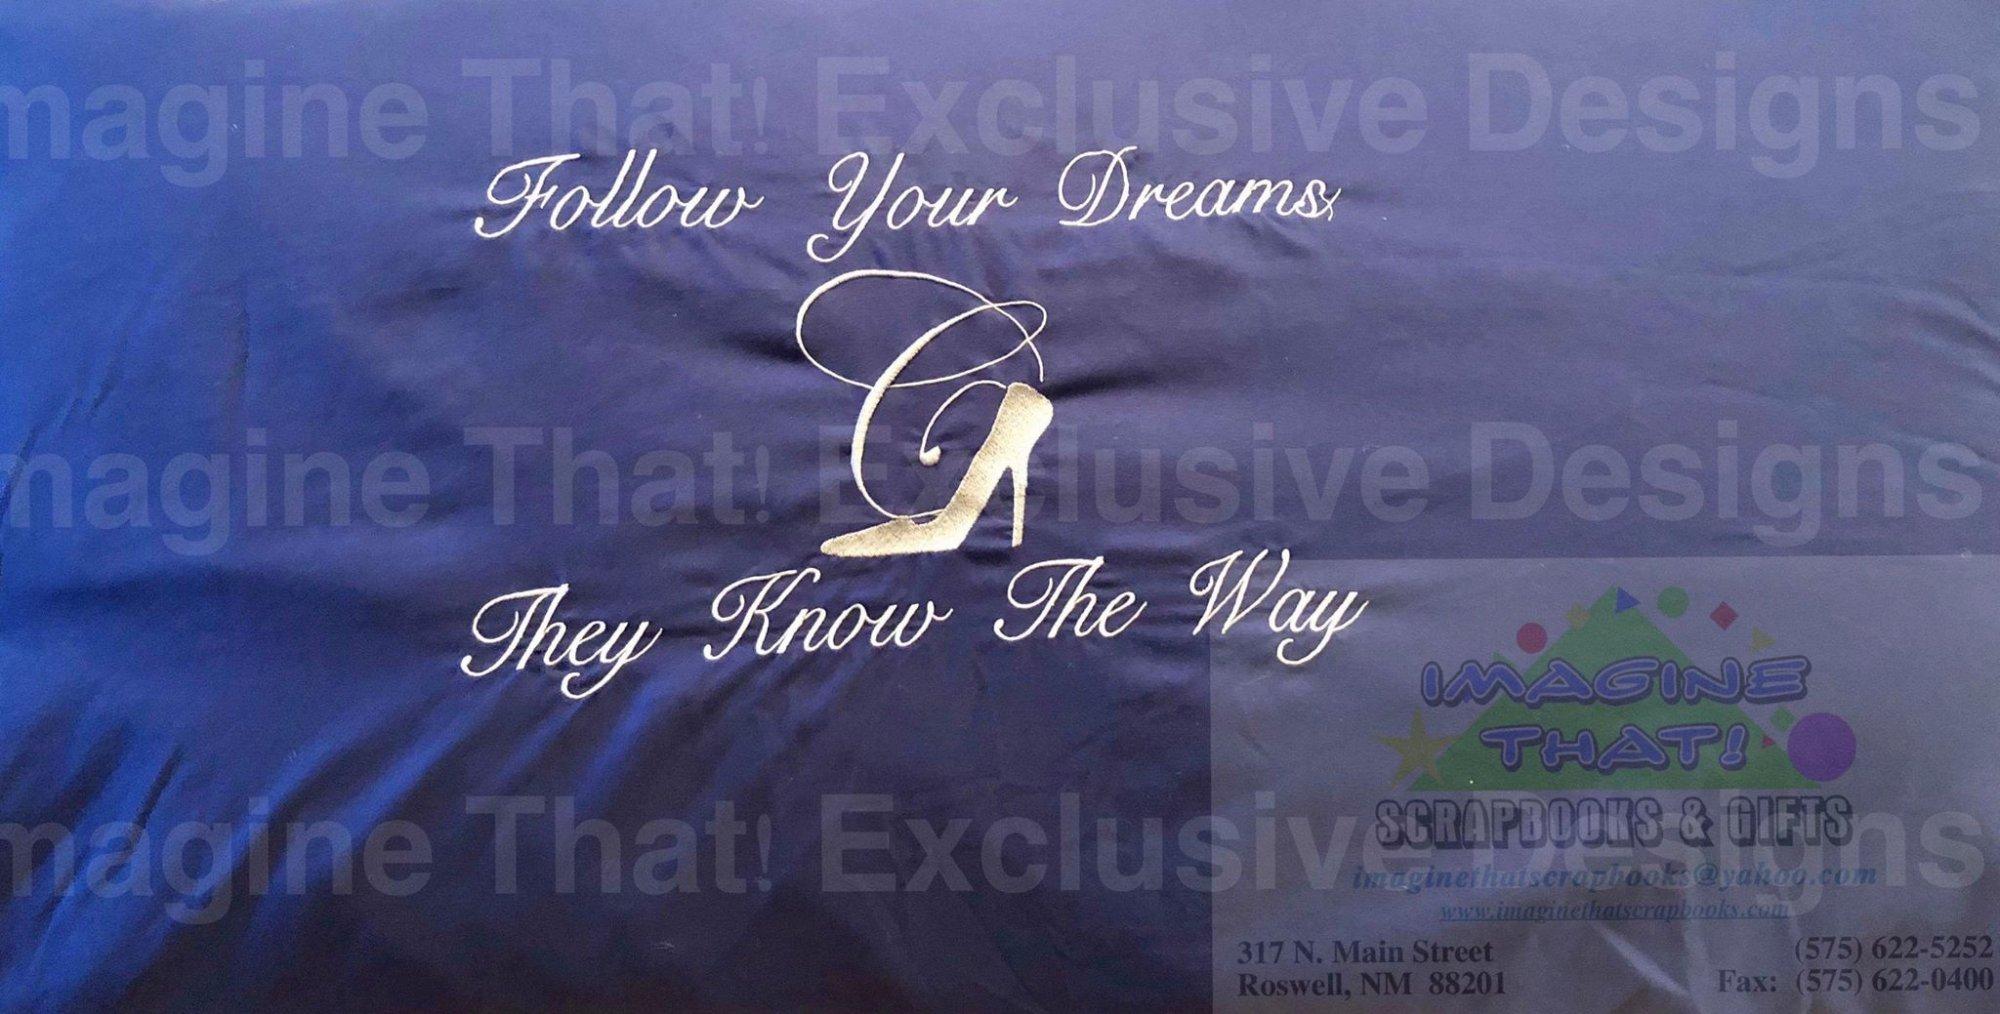 Dreams Pillow Case